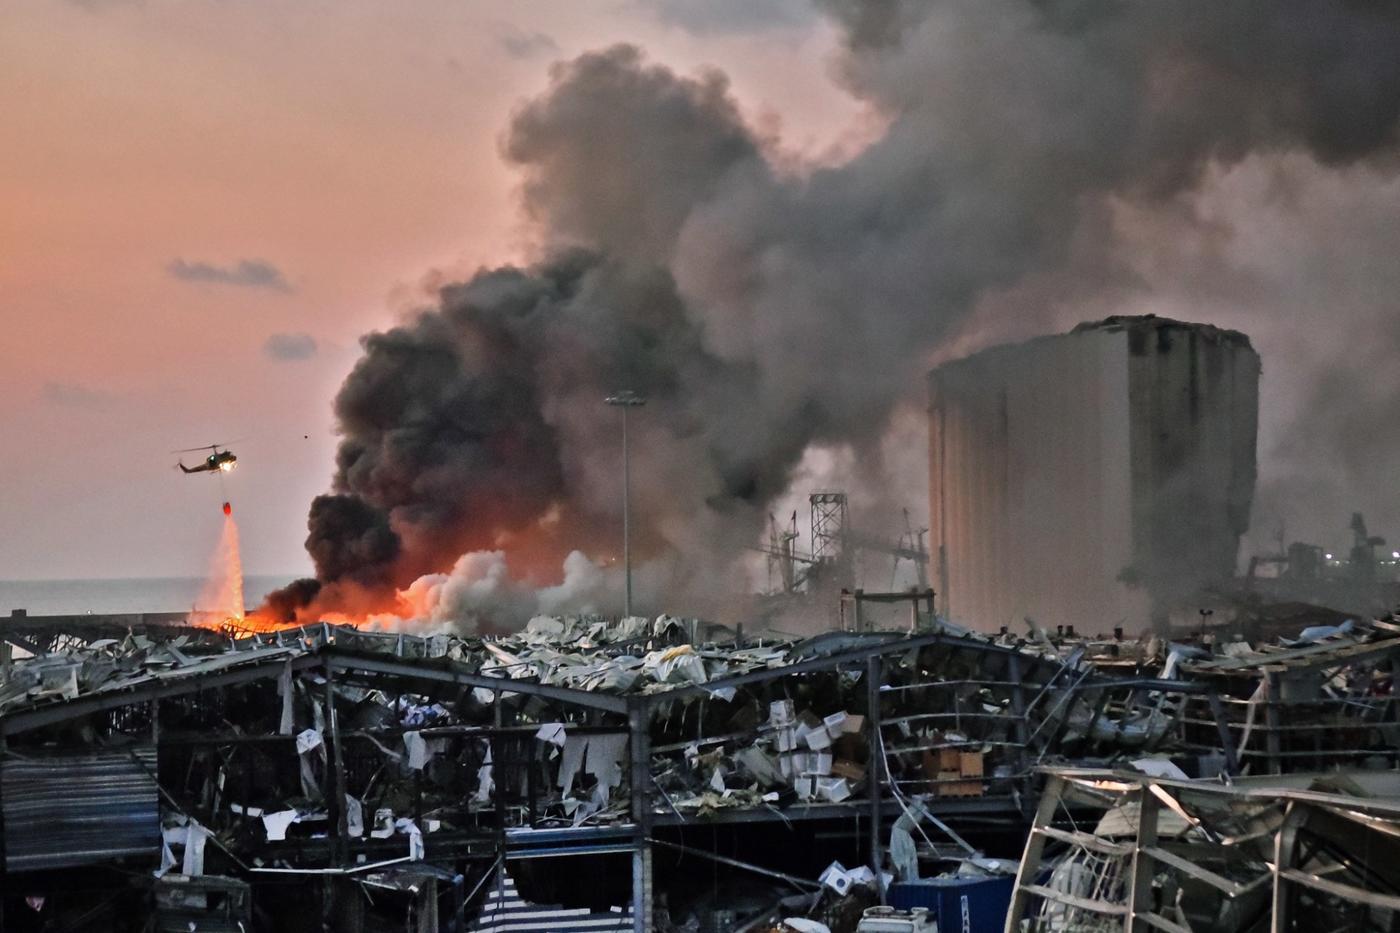 Beirut explosion: Large blast rocks Lebanese capital wounding thousands